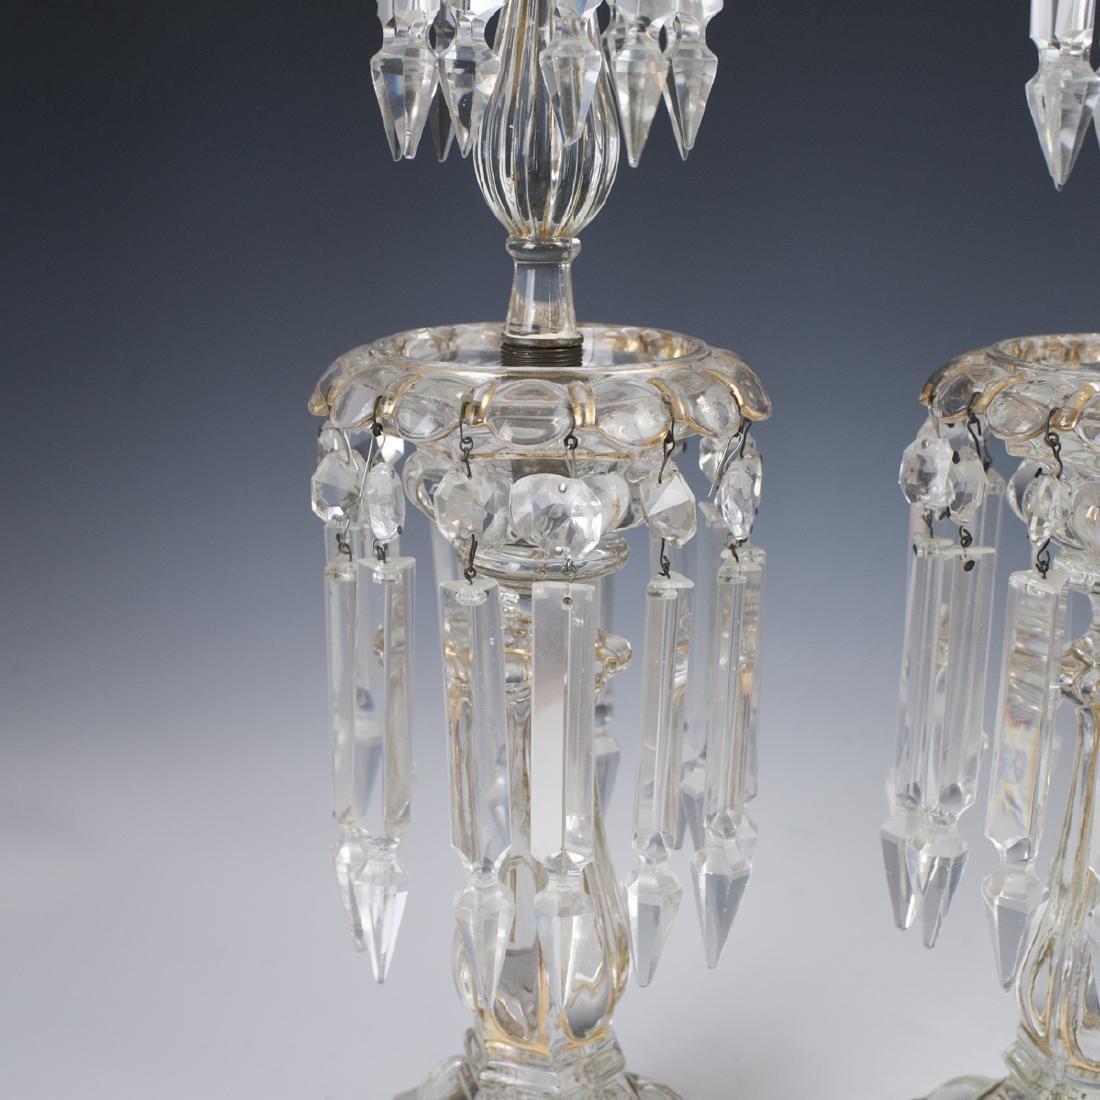 Antique Crystal Candlesticks - 3